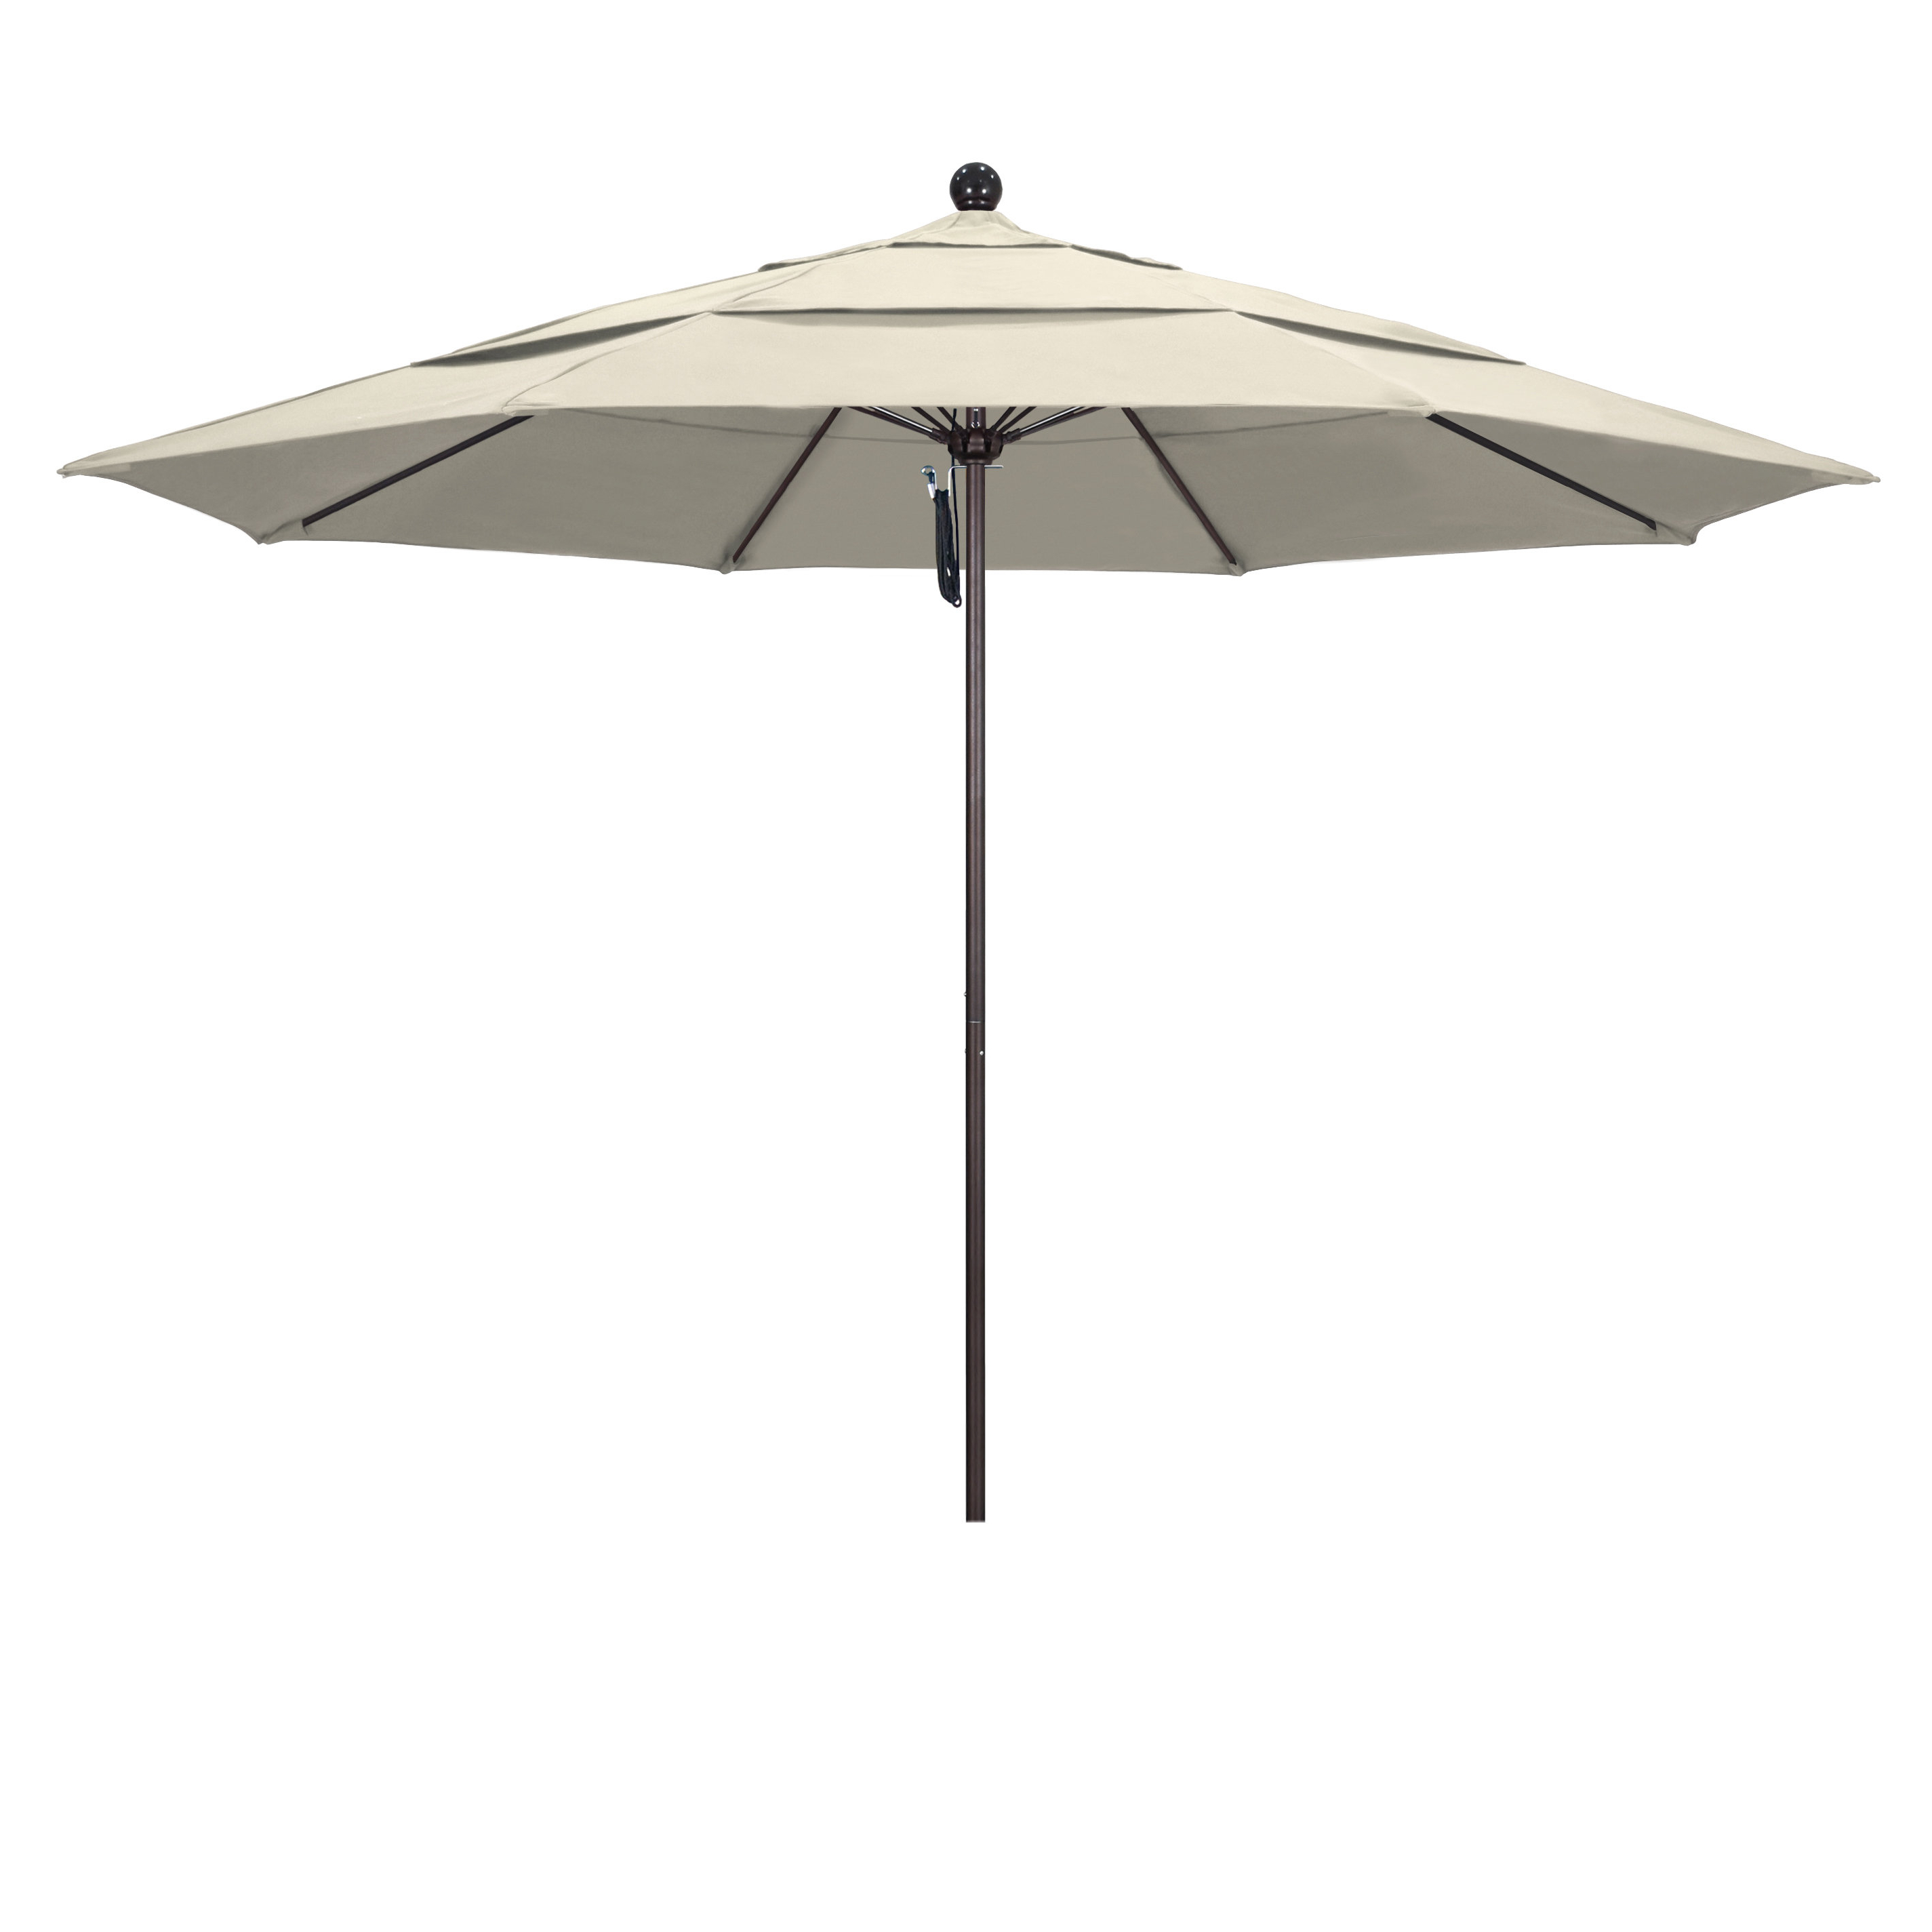 Caravelle 11' Market Umbrella In Fashionable Caravelle Square Market Sunbrella Umbrellas (View 8 of 20)